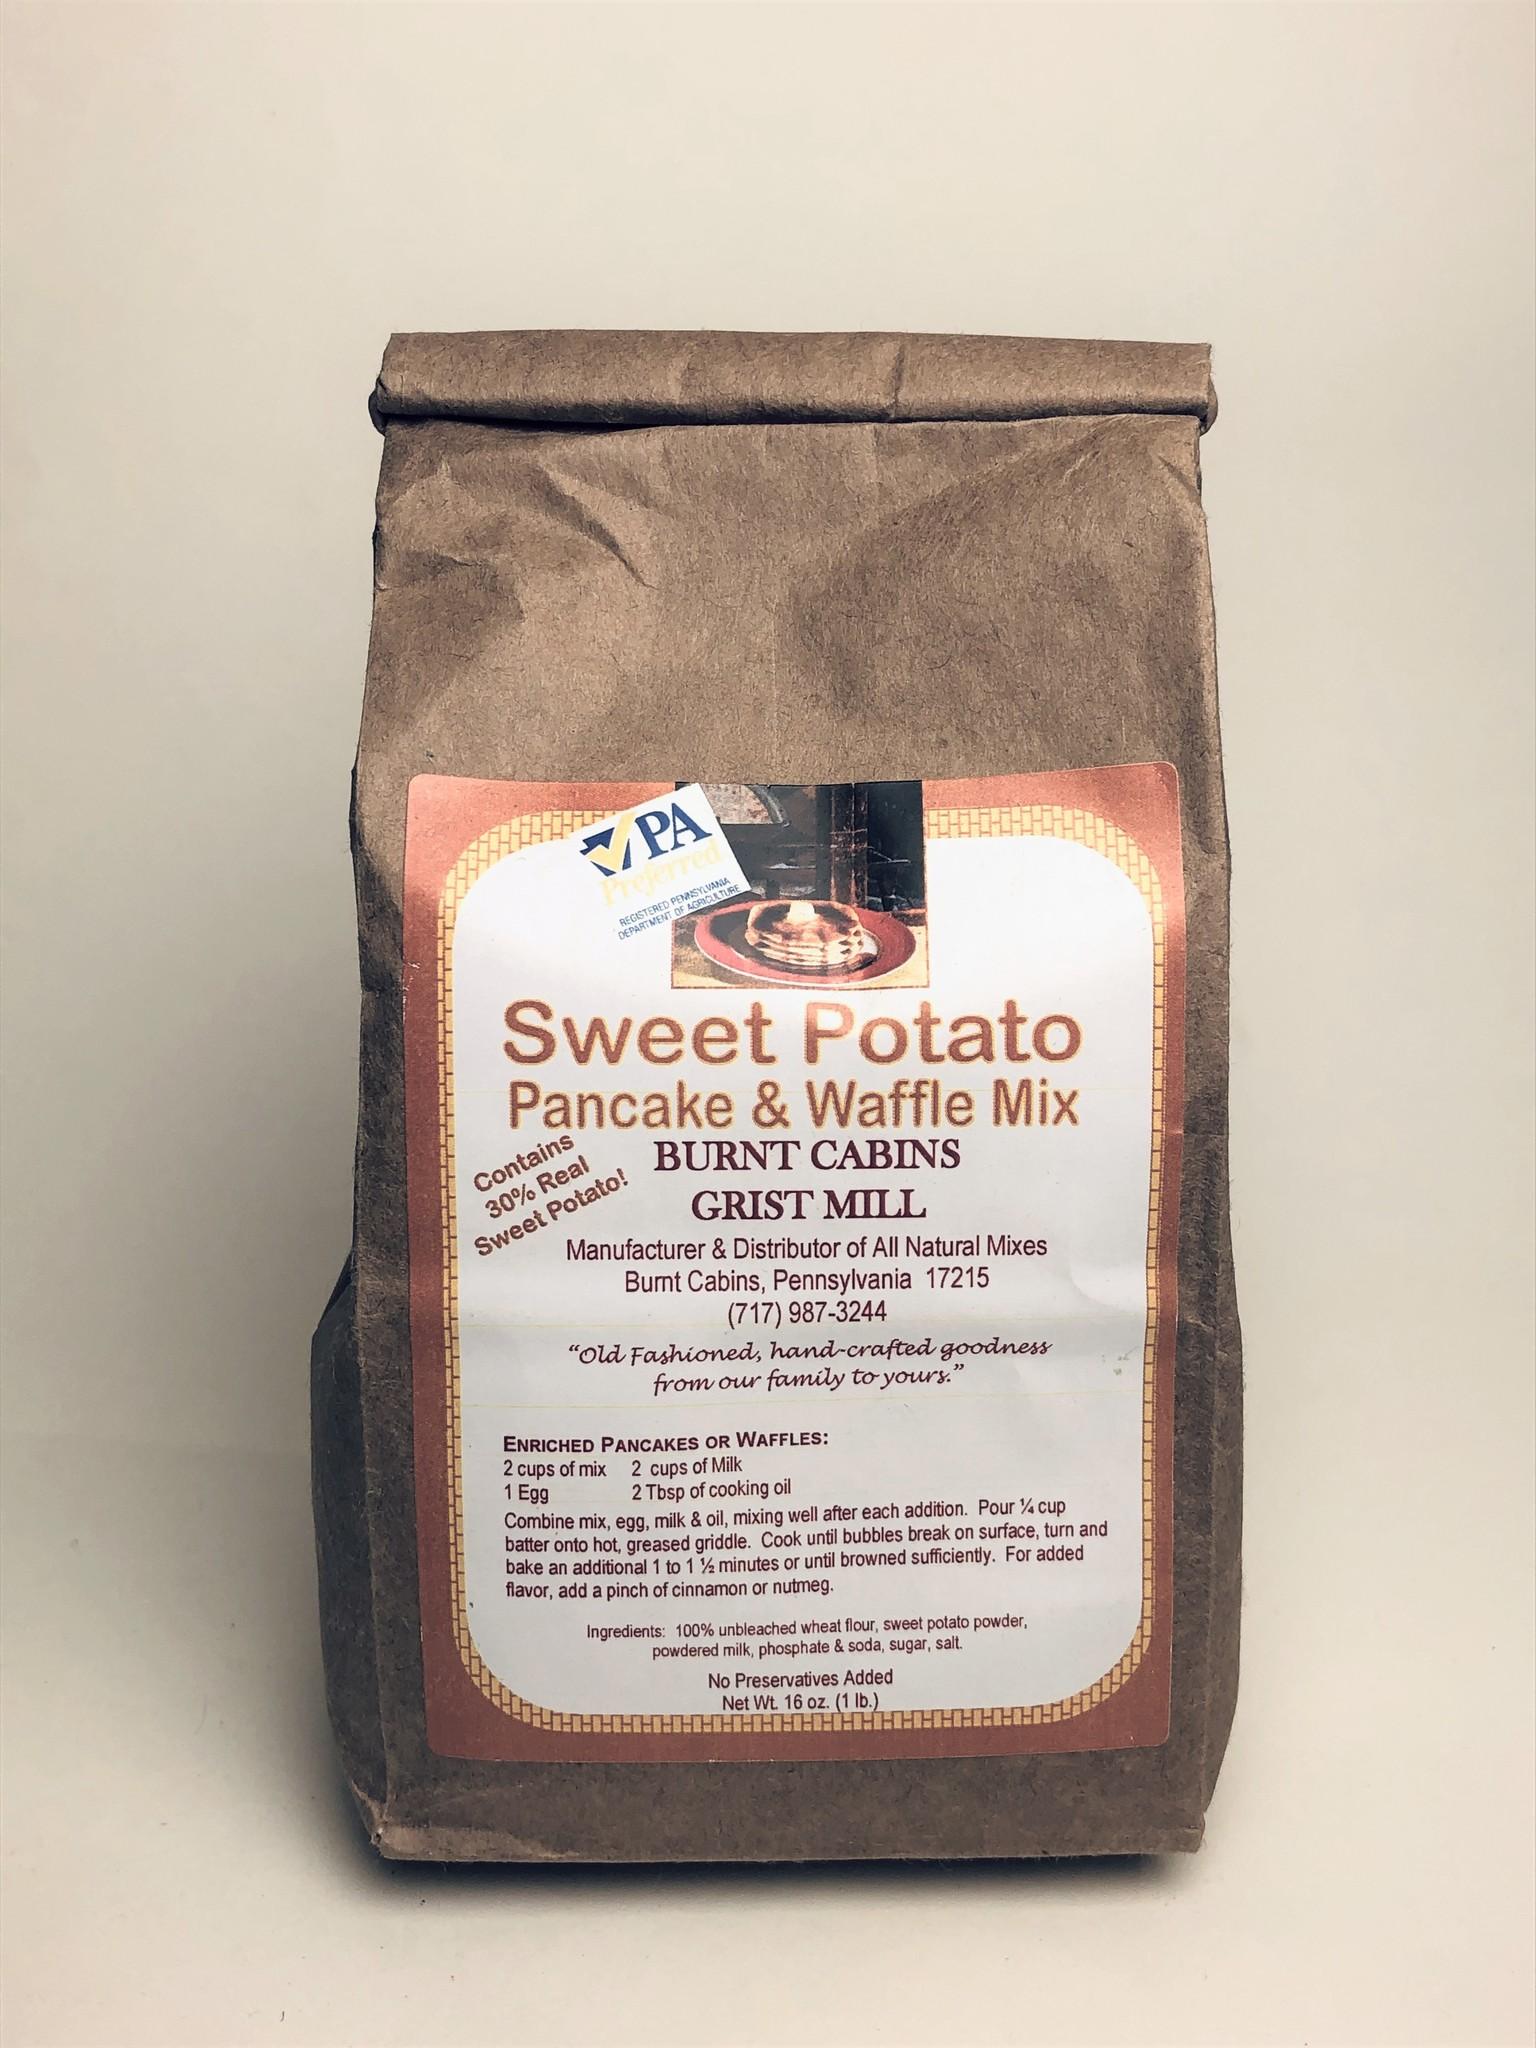 Burnt Cabins Grist Mill - Sweet Potato Pancake & Waffle Mix 1 lb.